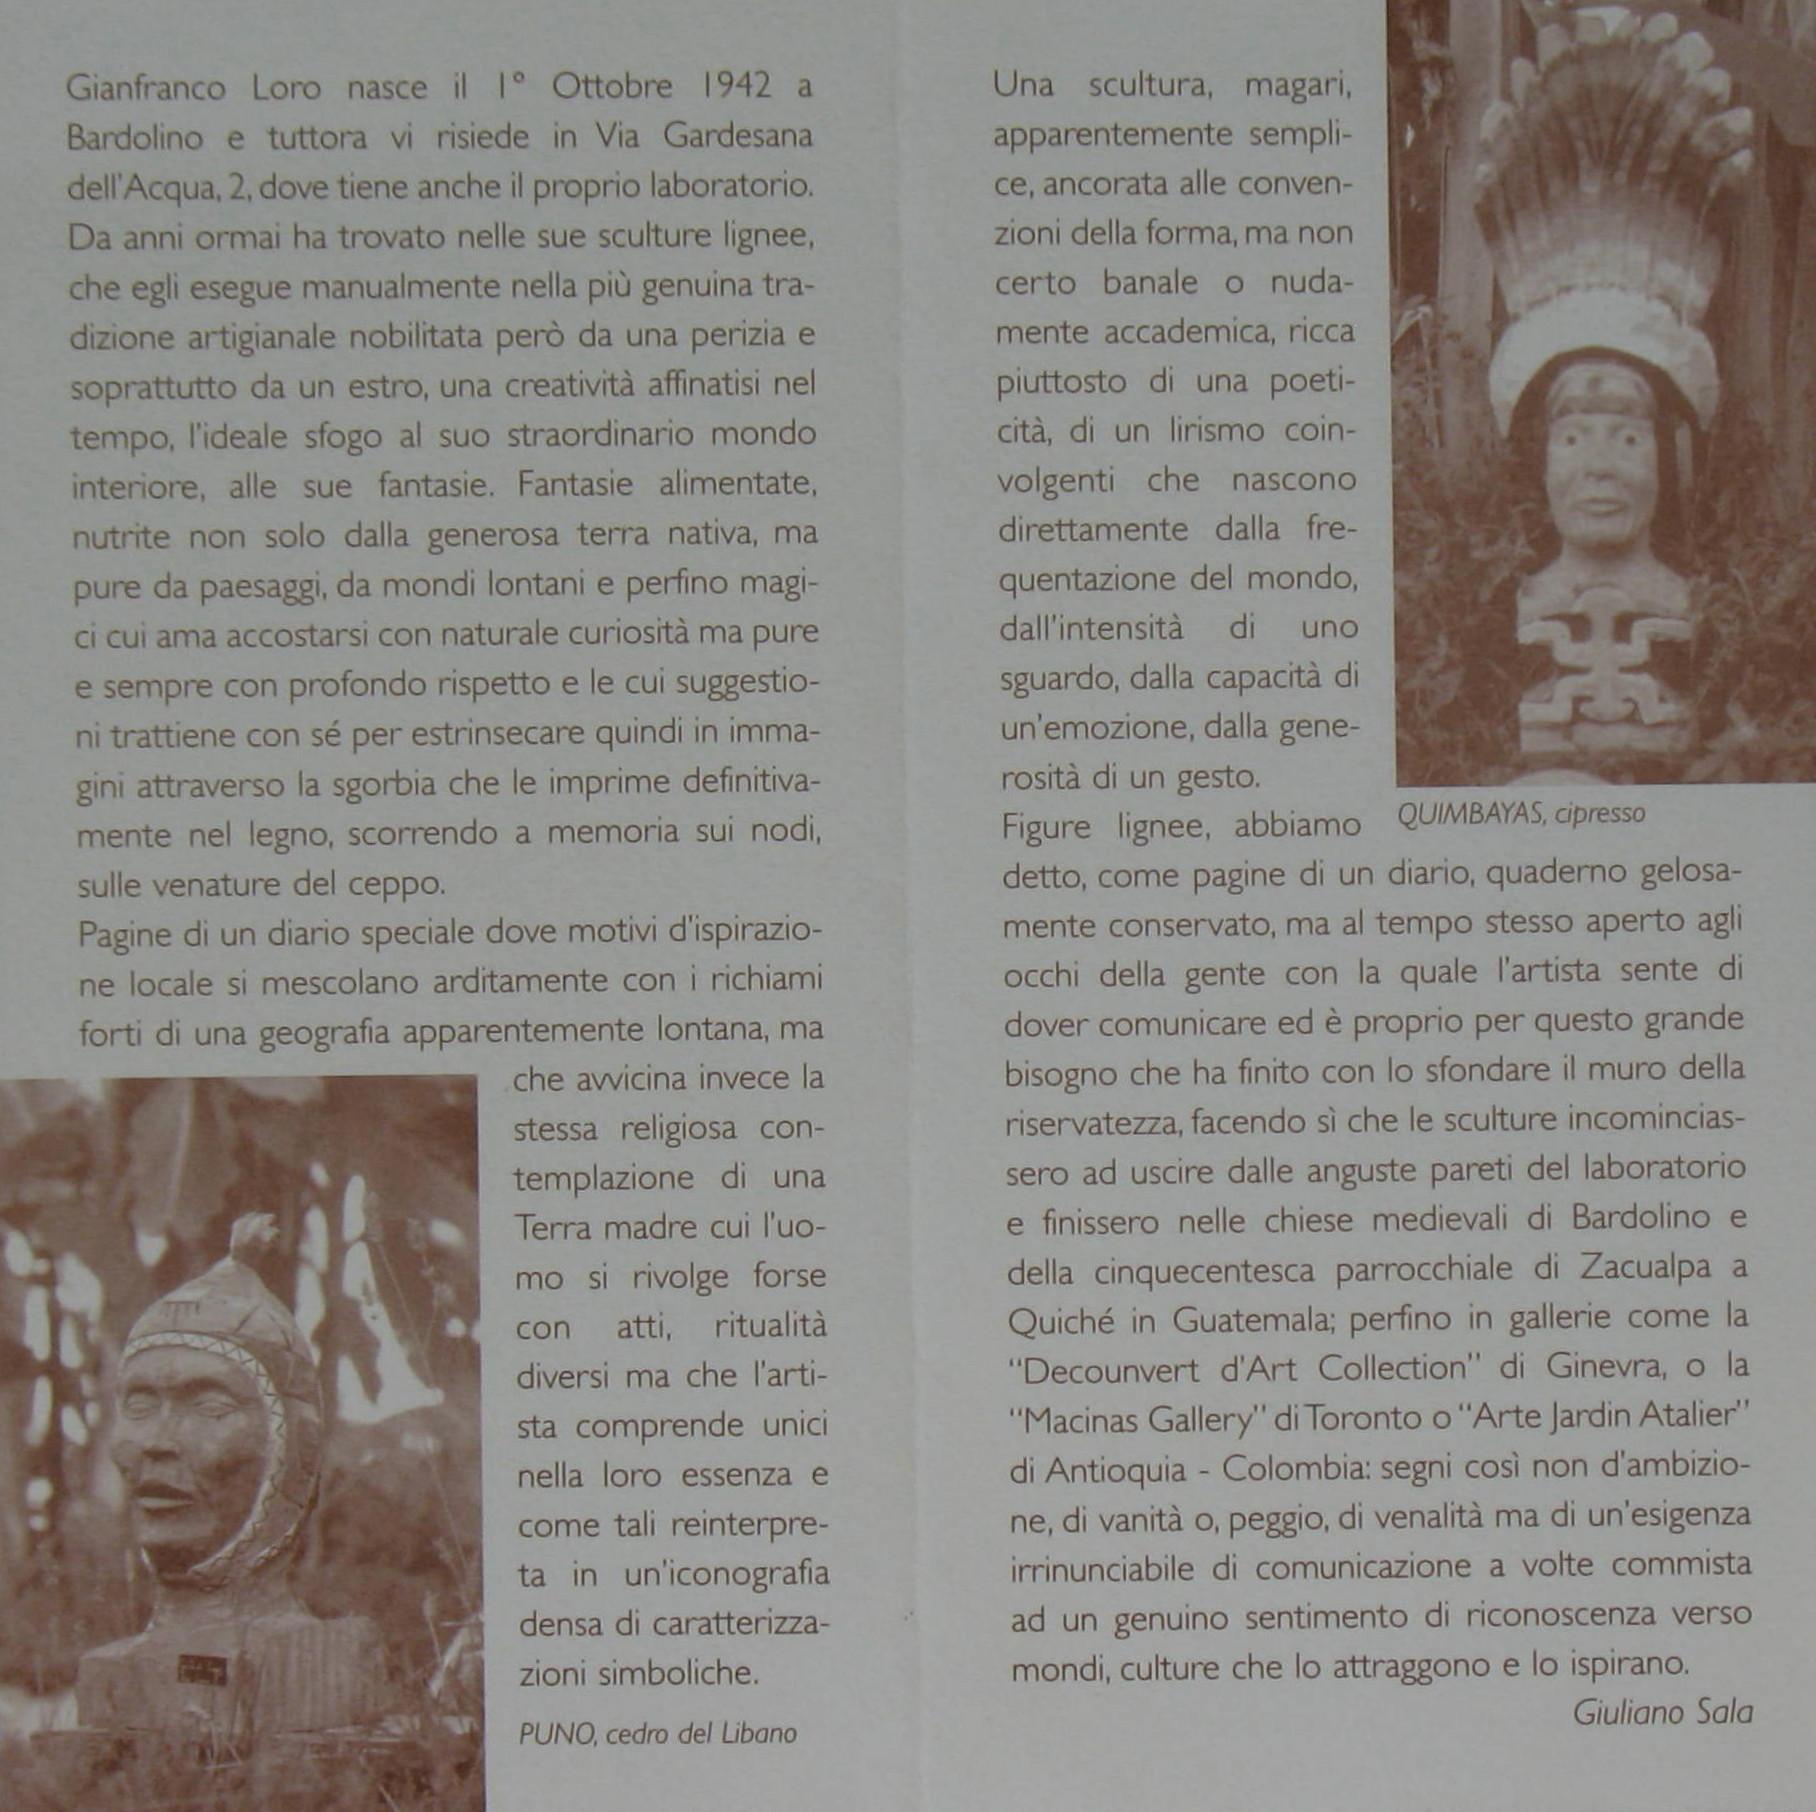 Gianfranco Joe Loro scultore